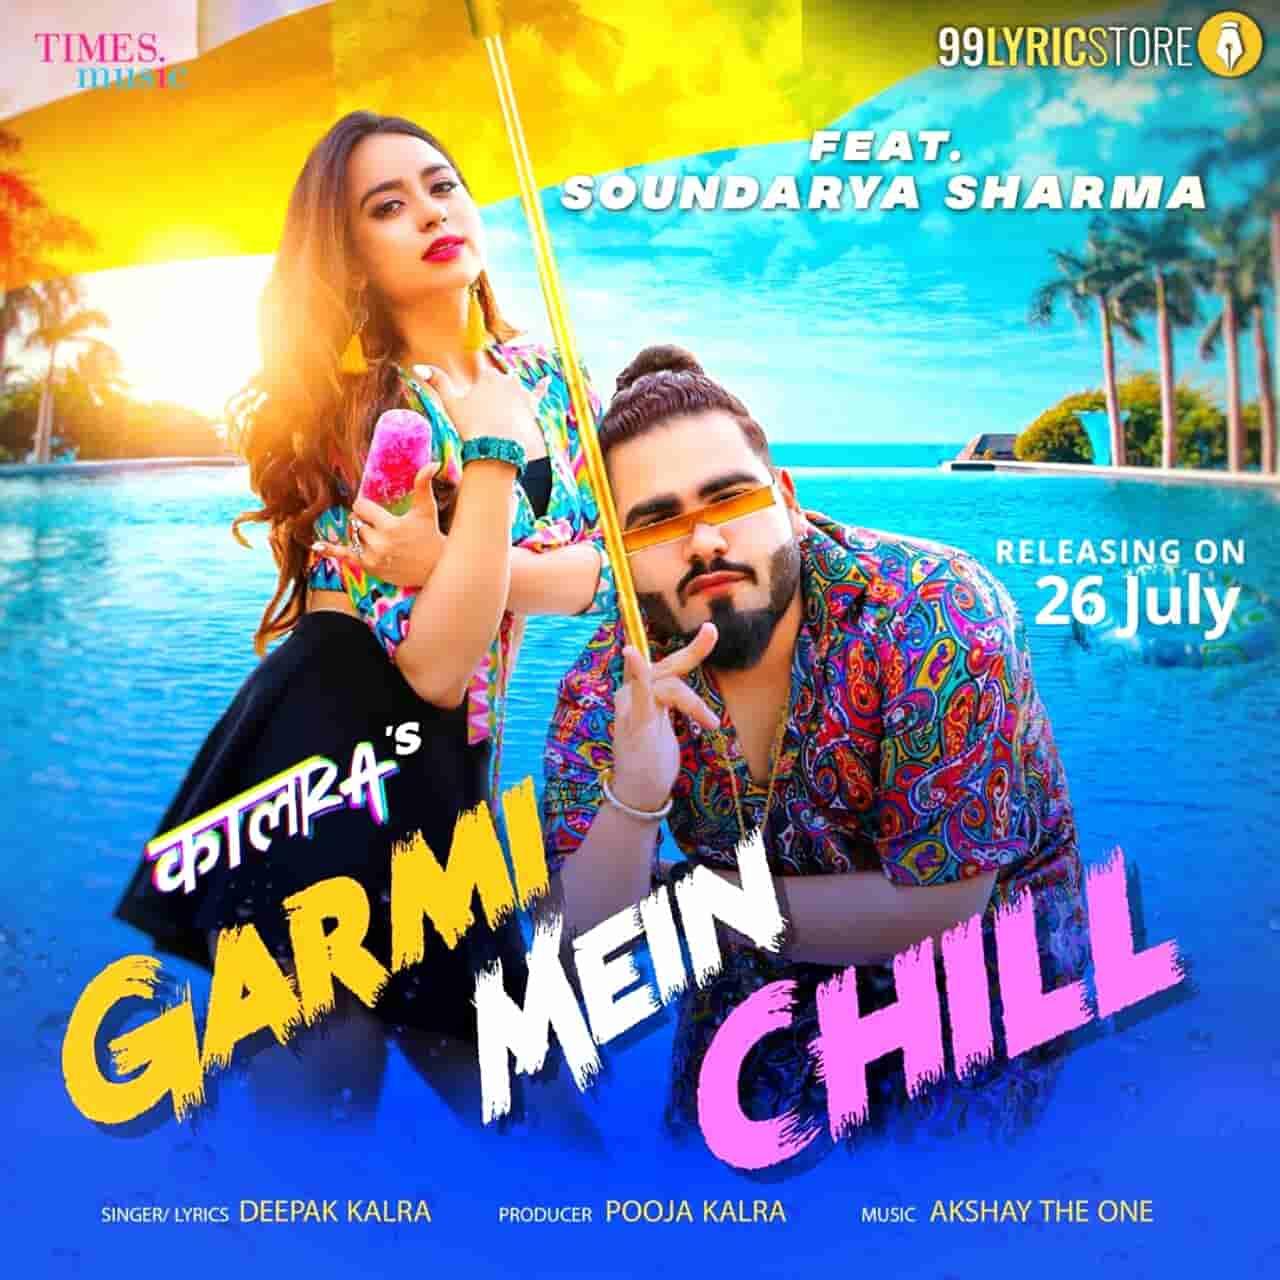 Garmi Mein Chill Lyrics Sung by Deepak Kalra